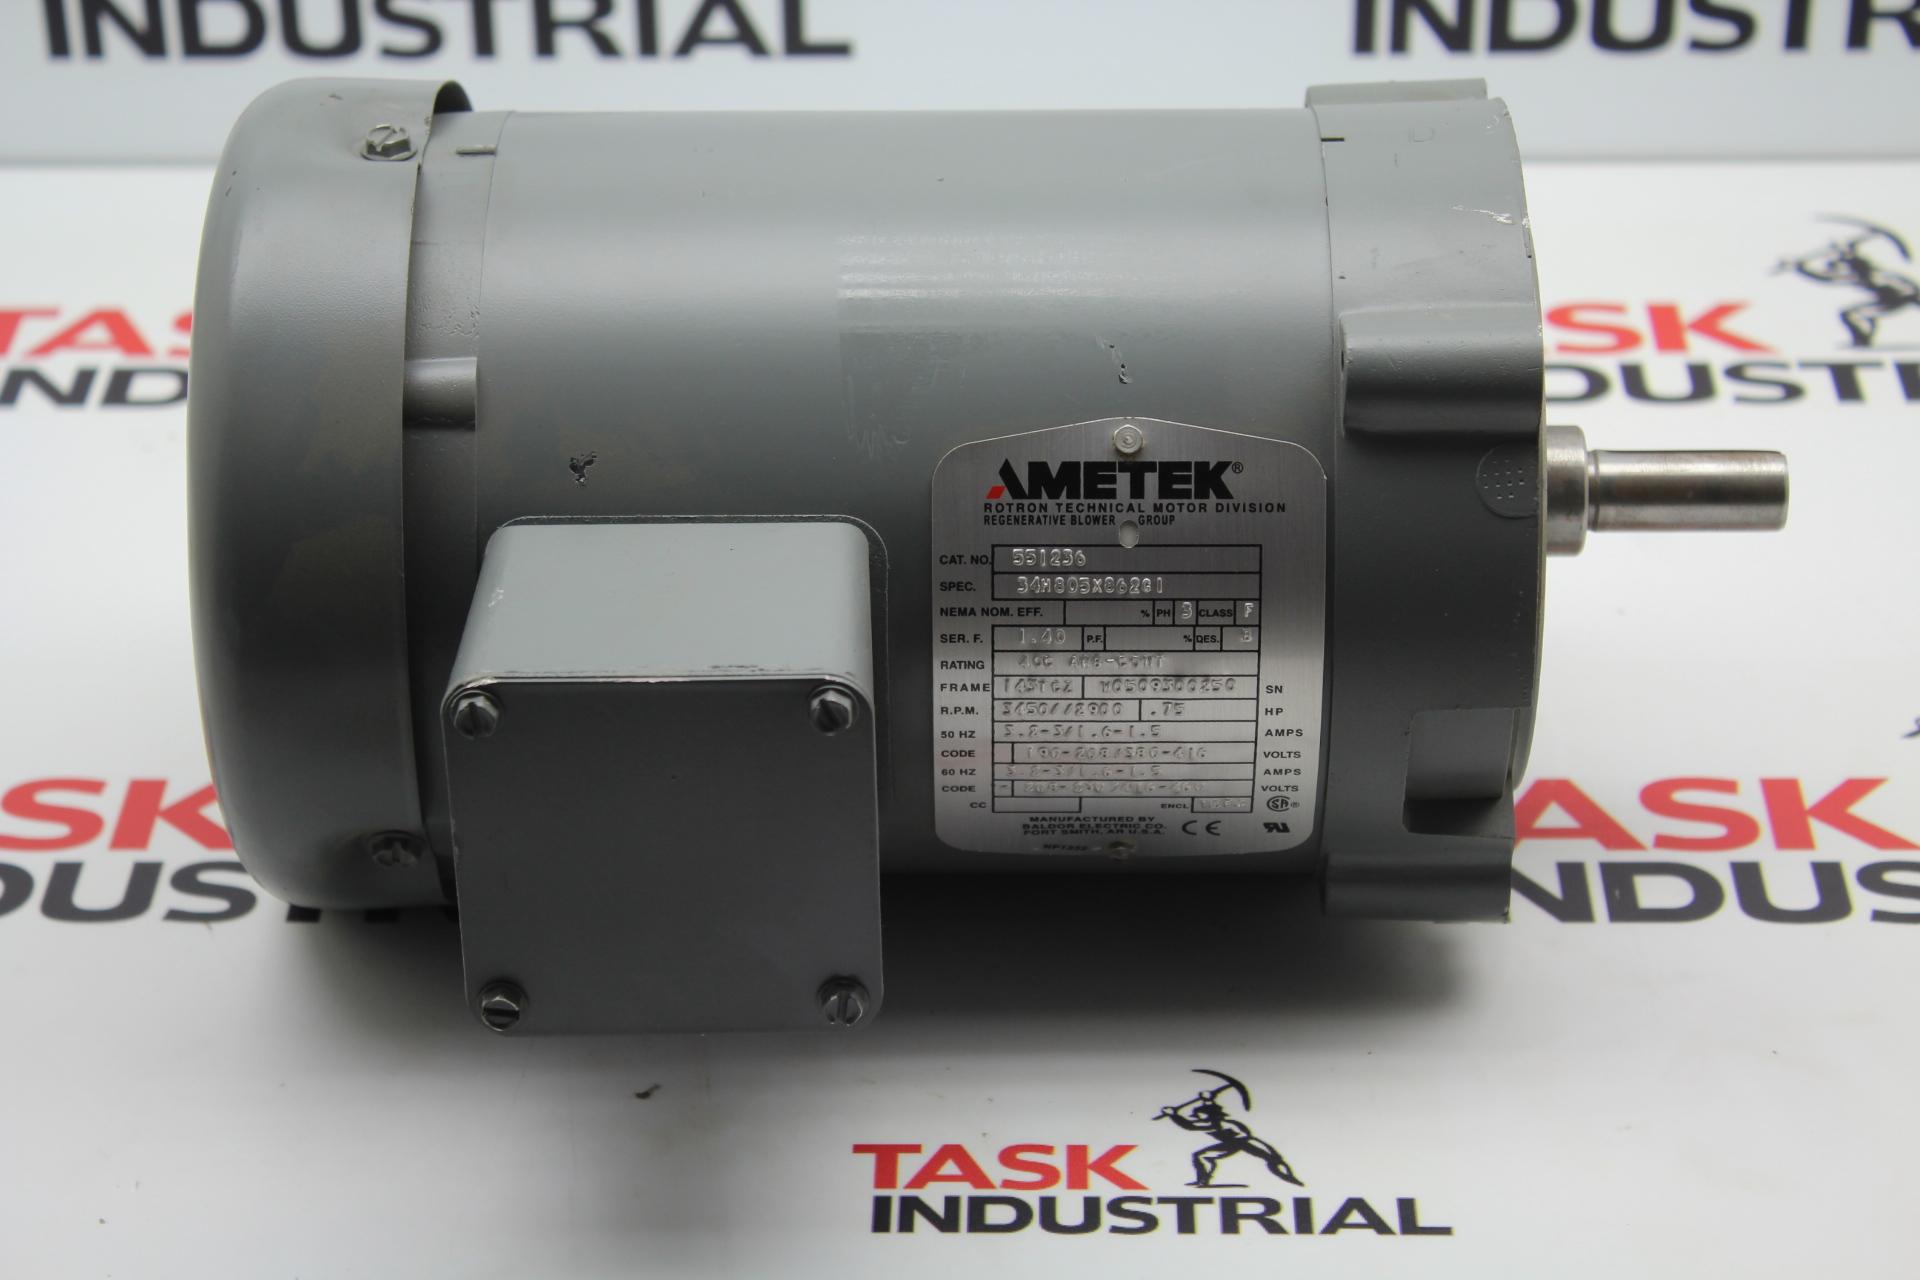 Ametek 551236 .75 HP, 143TCZ FRAME, ROM 3450/2900, 3 PH Motor